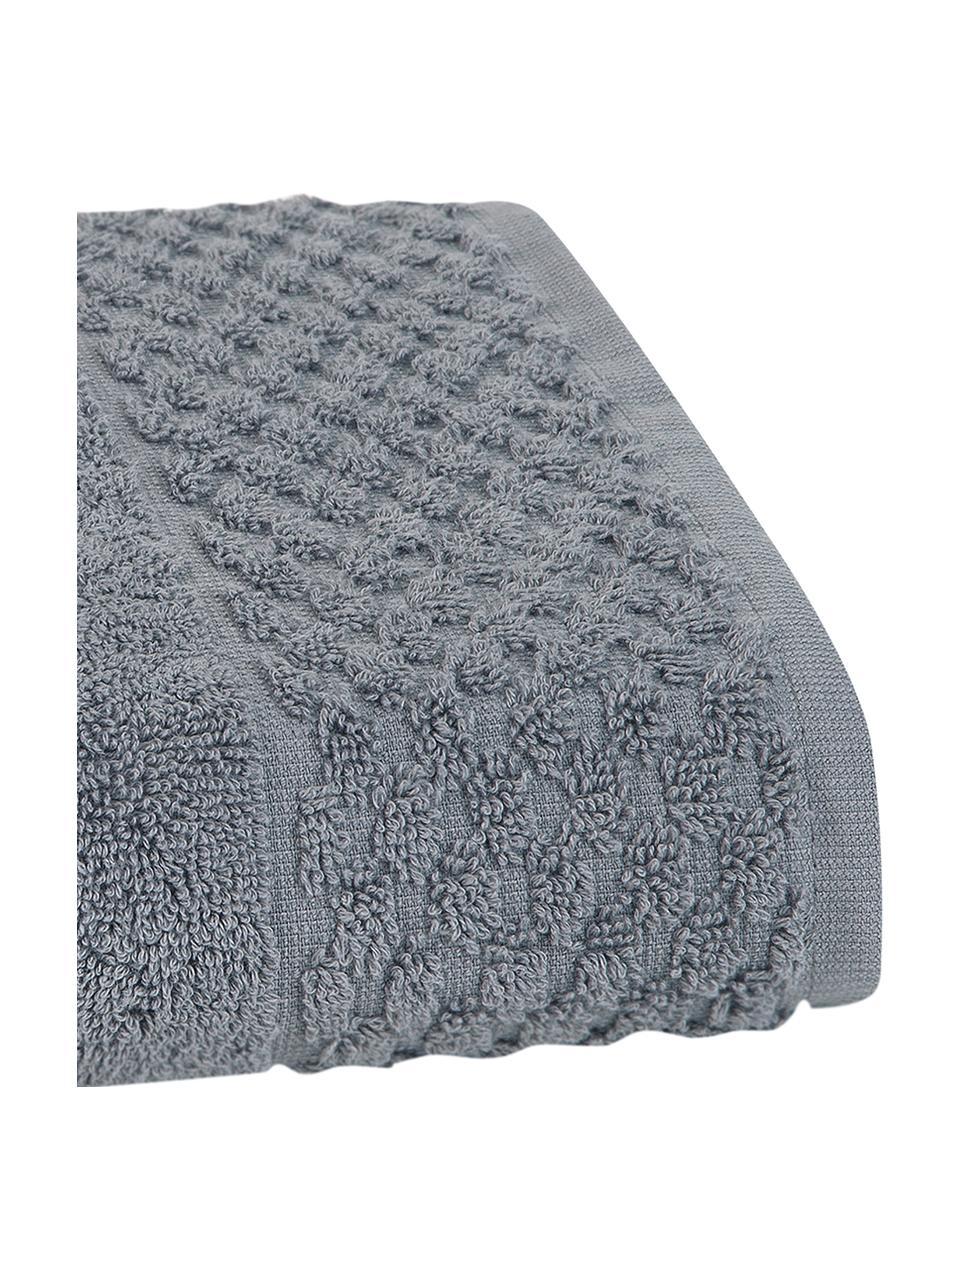 Set 3 asciugamani con motivo a nido d'ape Katharina, Grigio scuro, Set in varie misure